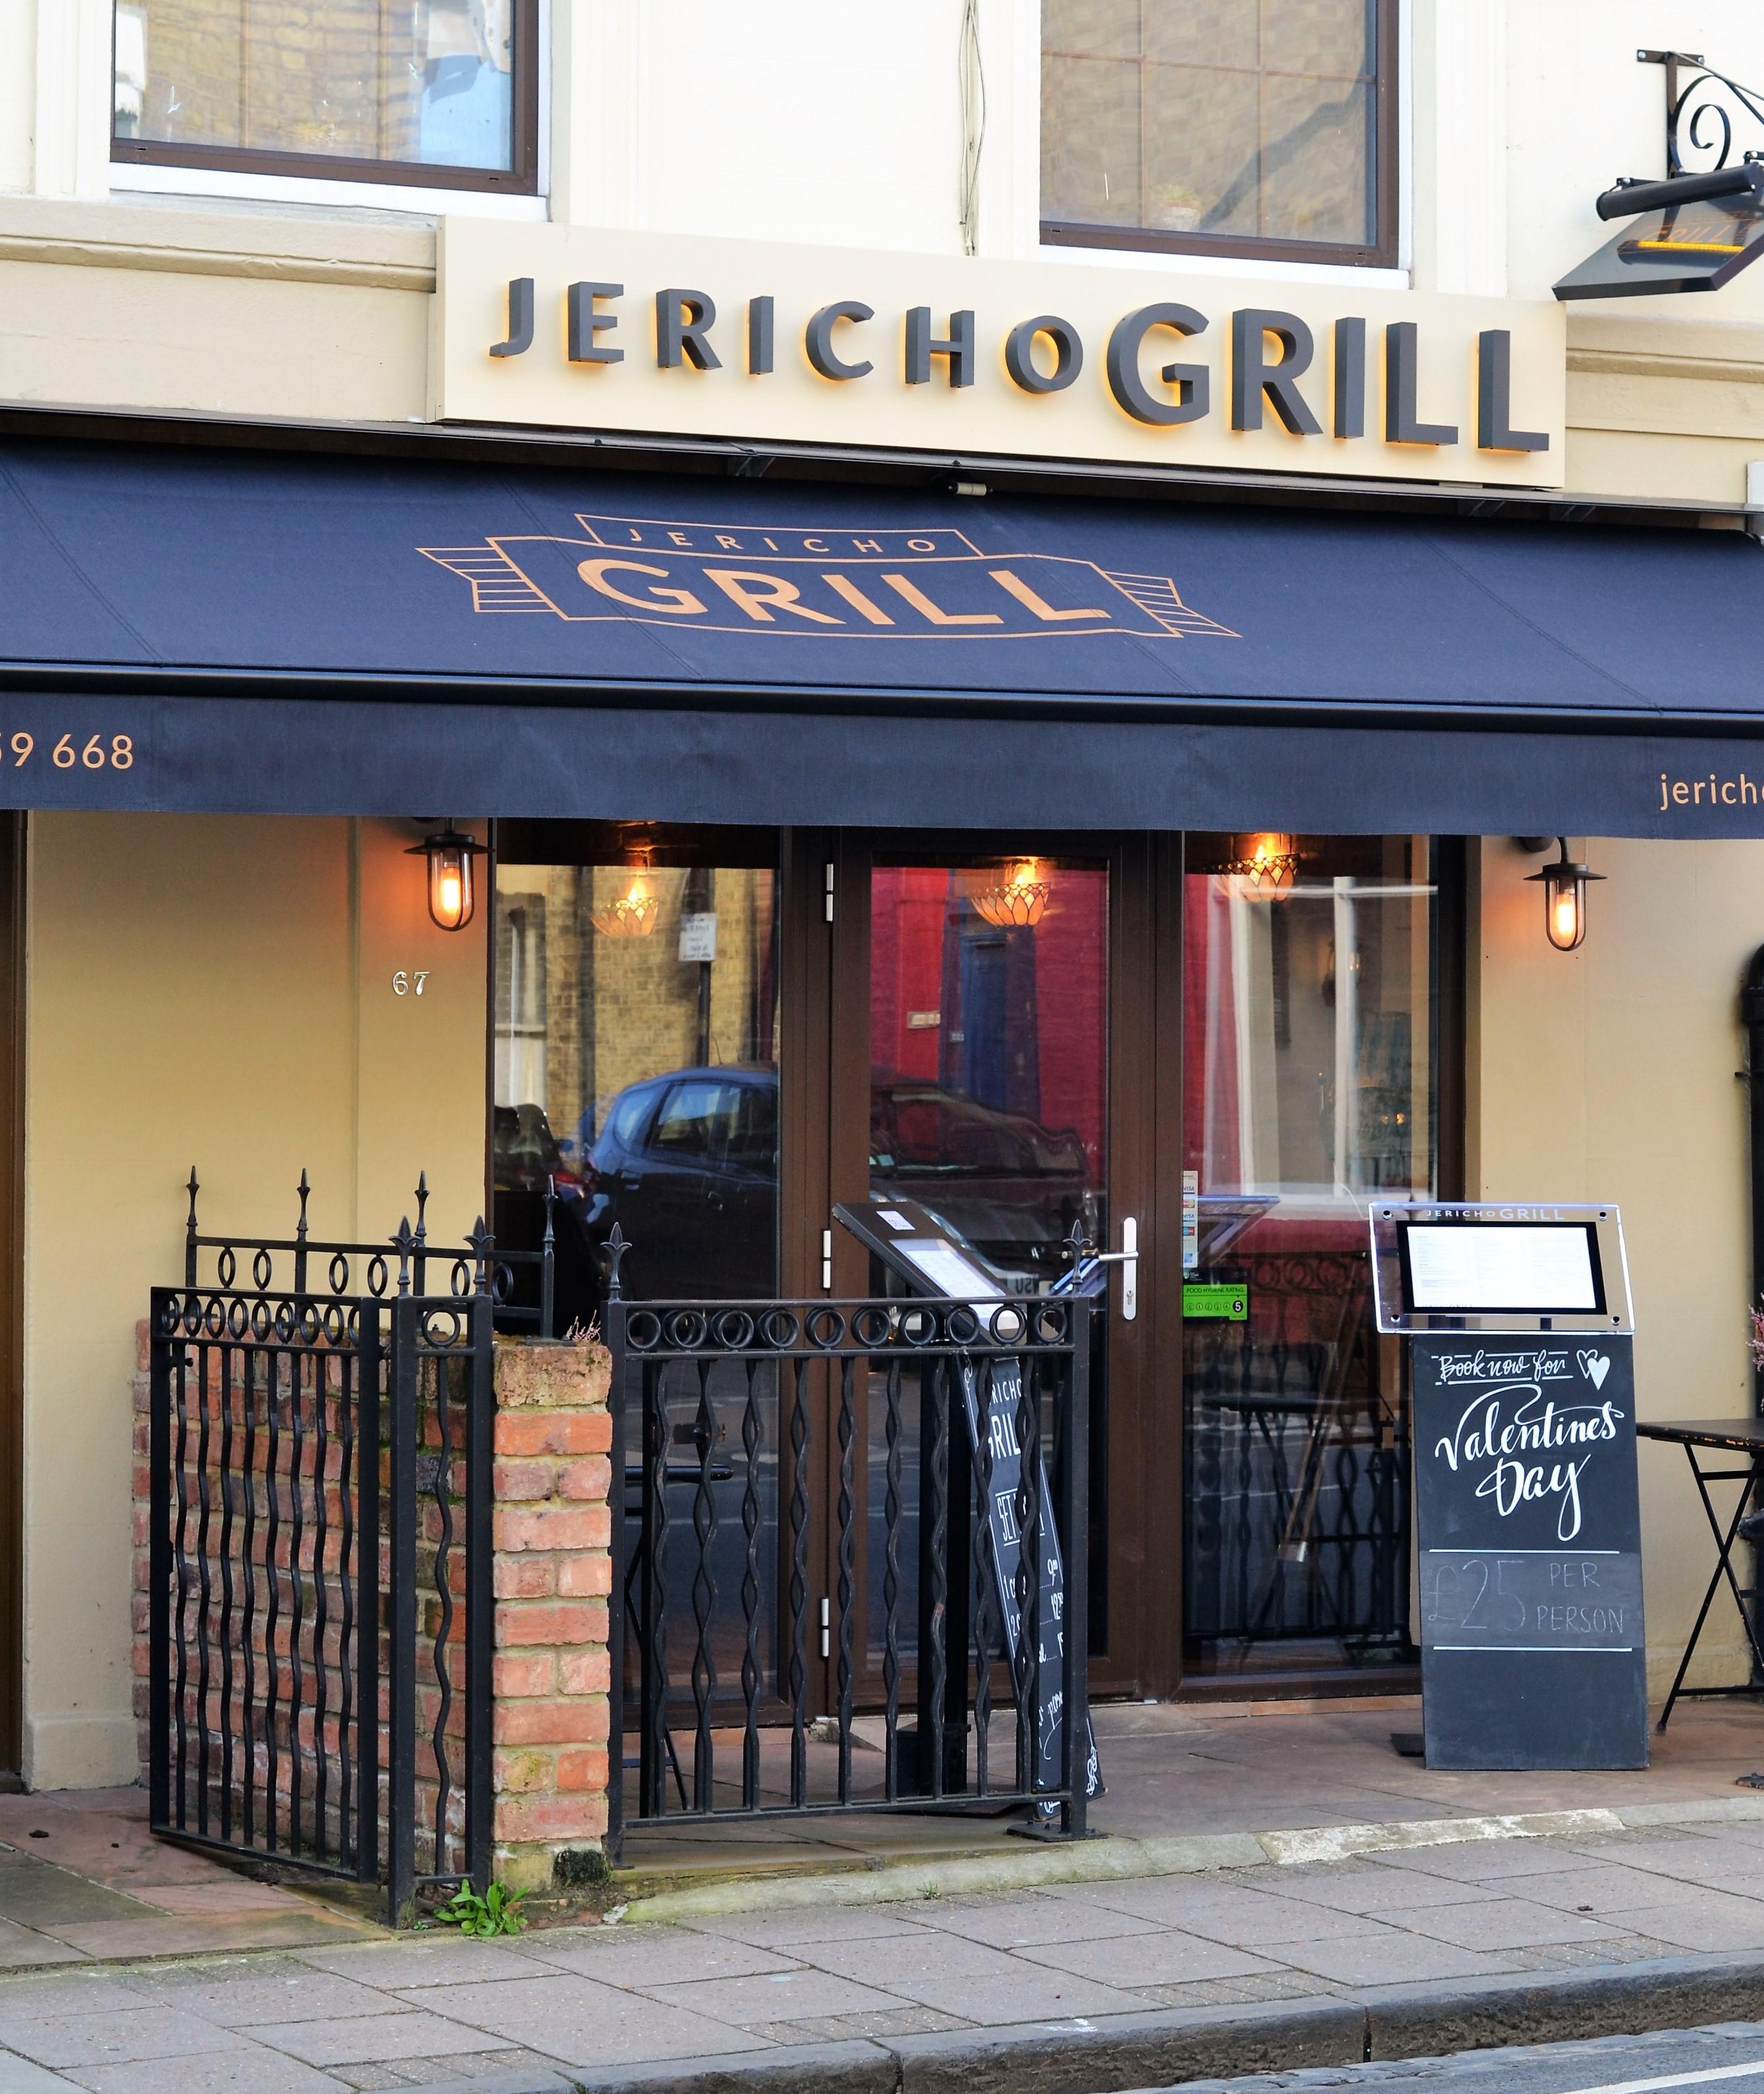 Jericho Grill, Walton Street Oxford